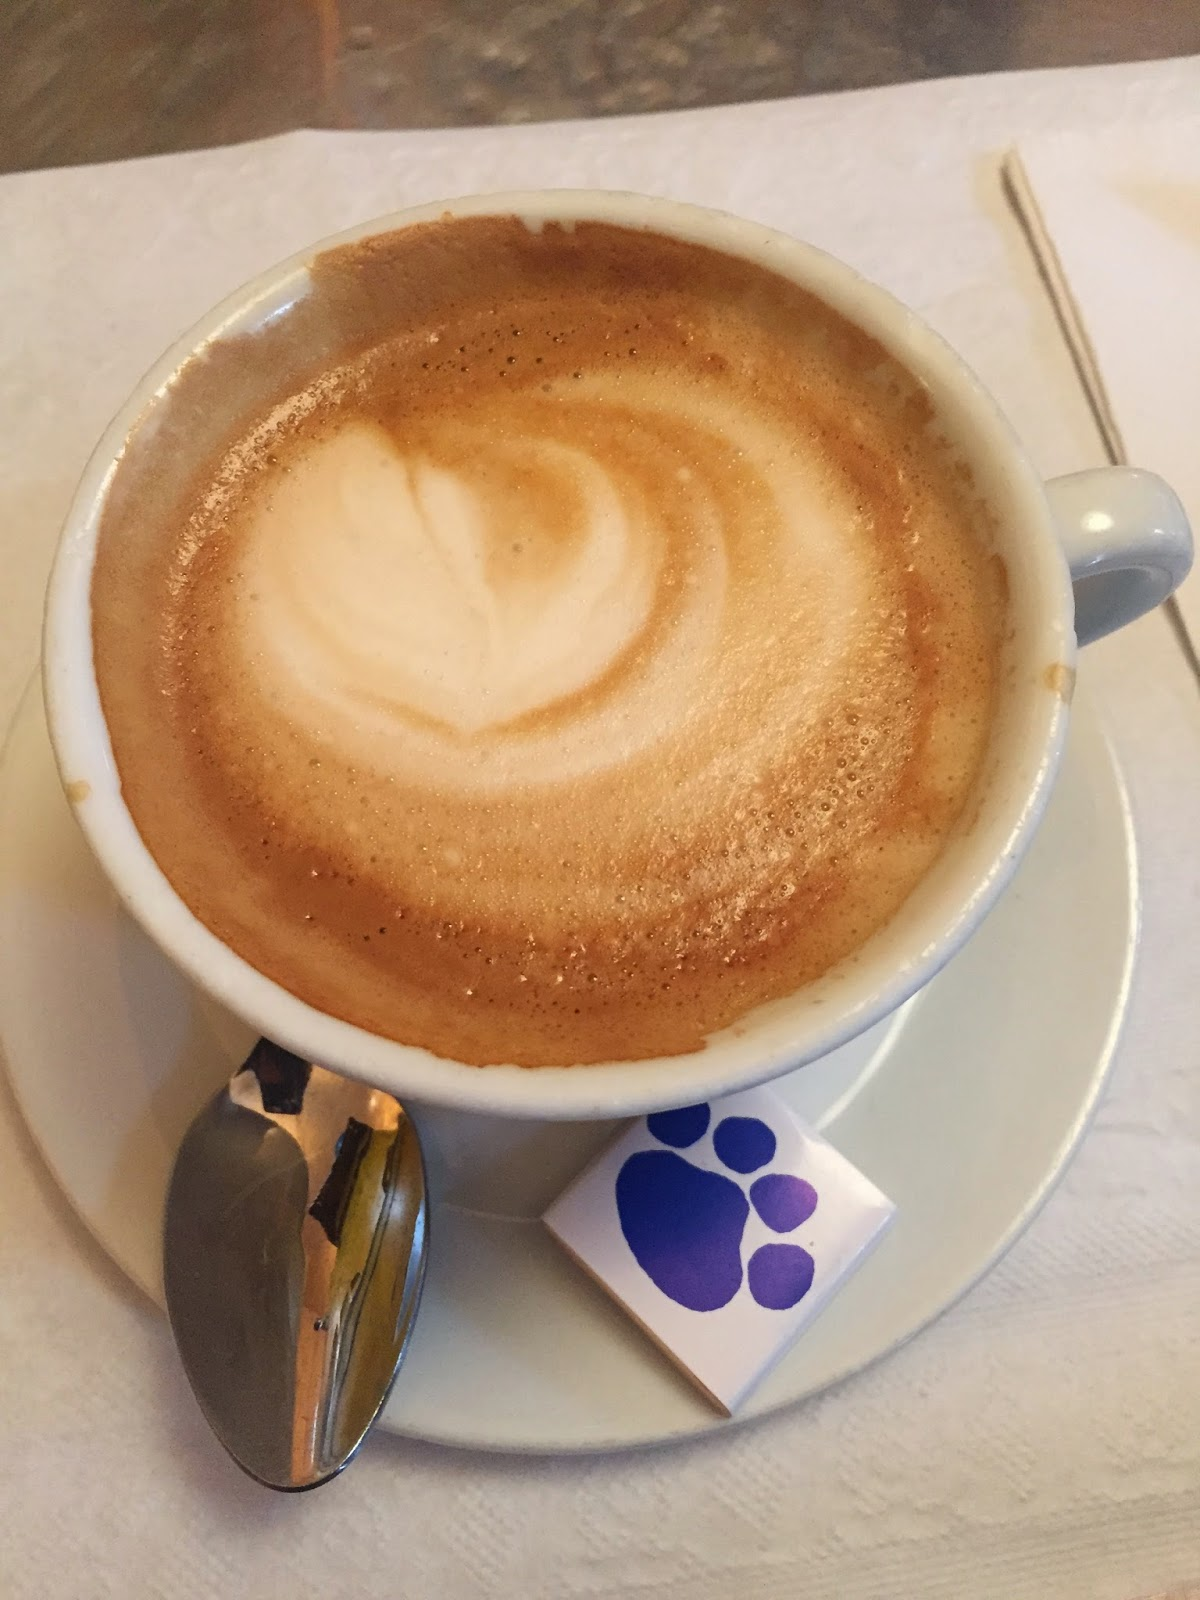 Latte with Soy Milk - Cafe Gitane NYC Vegan